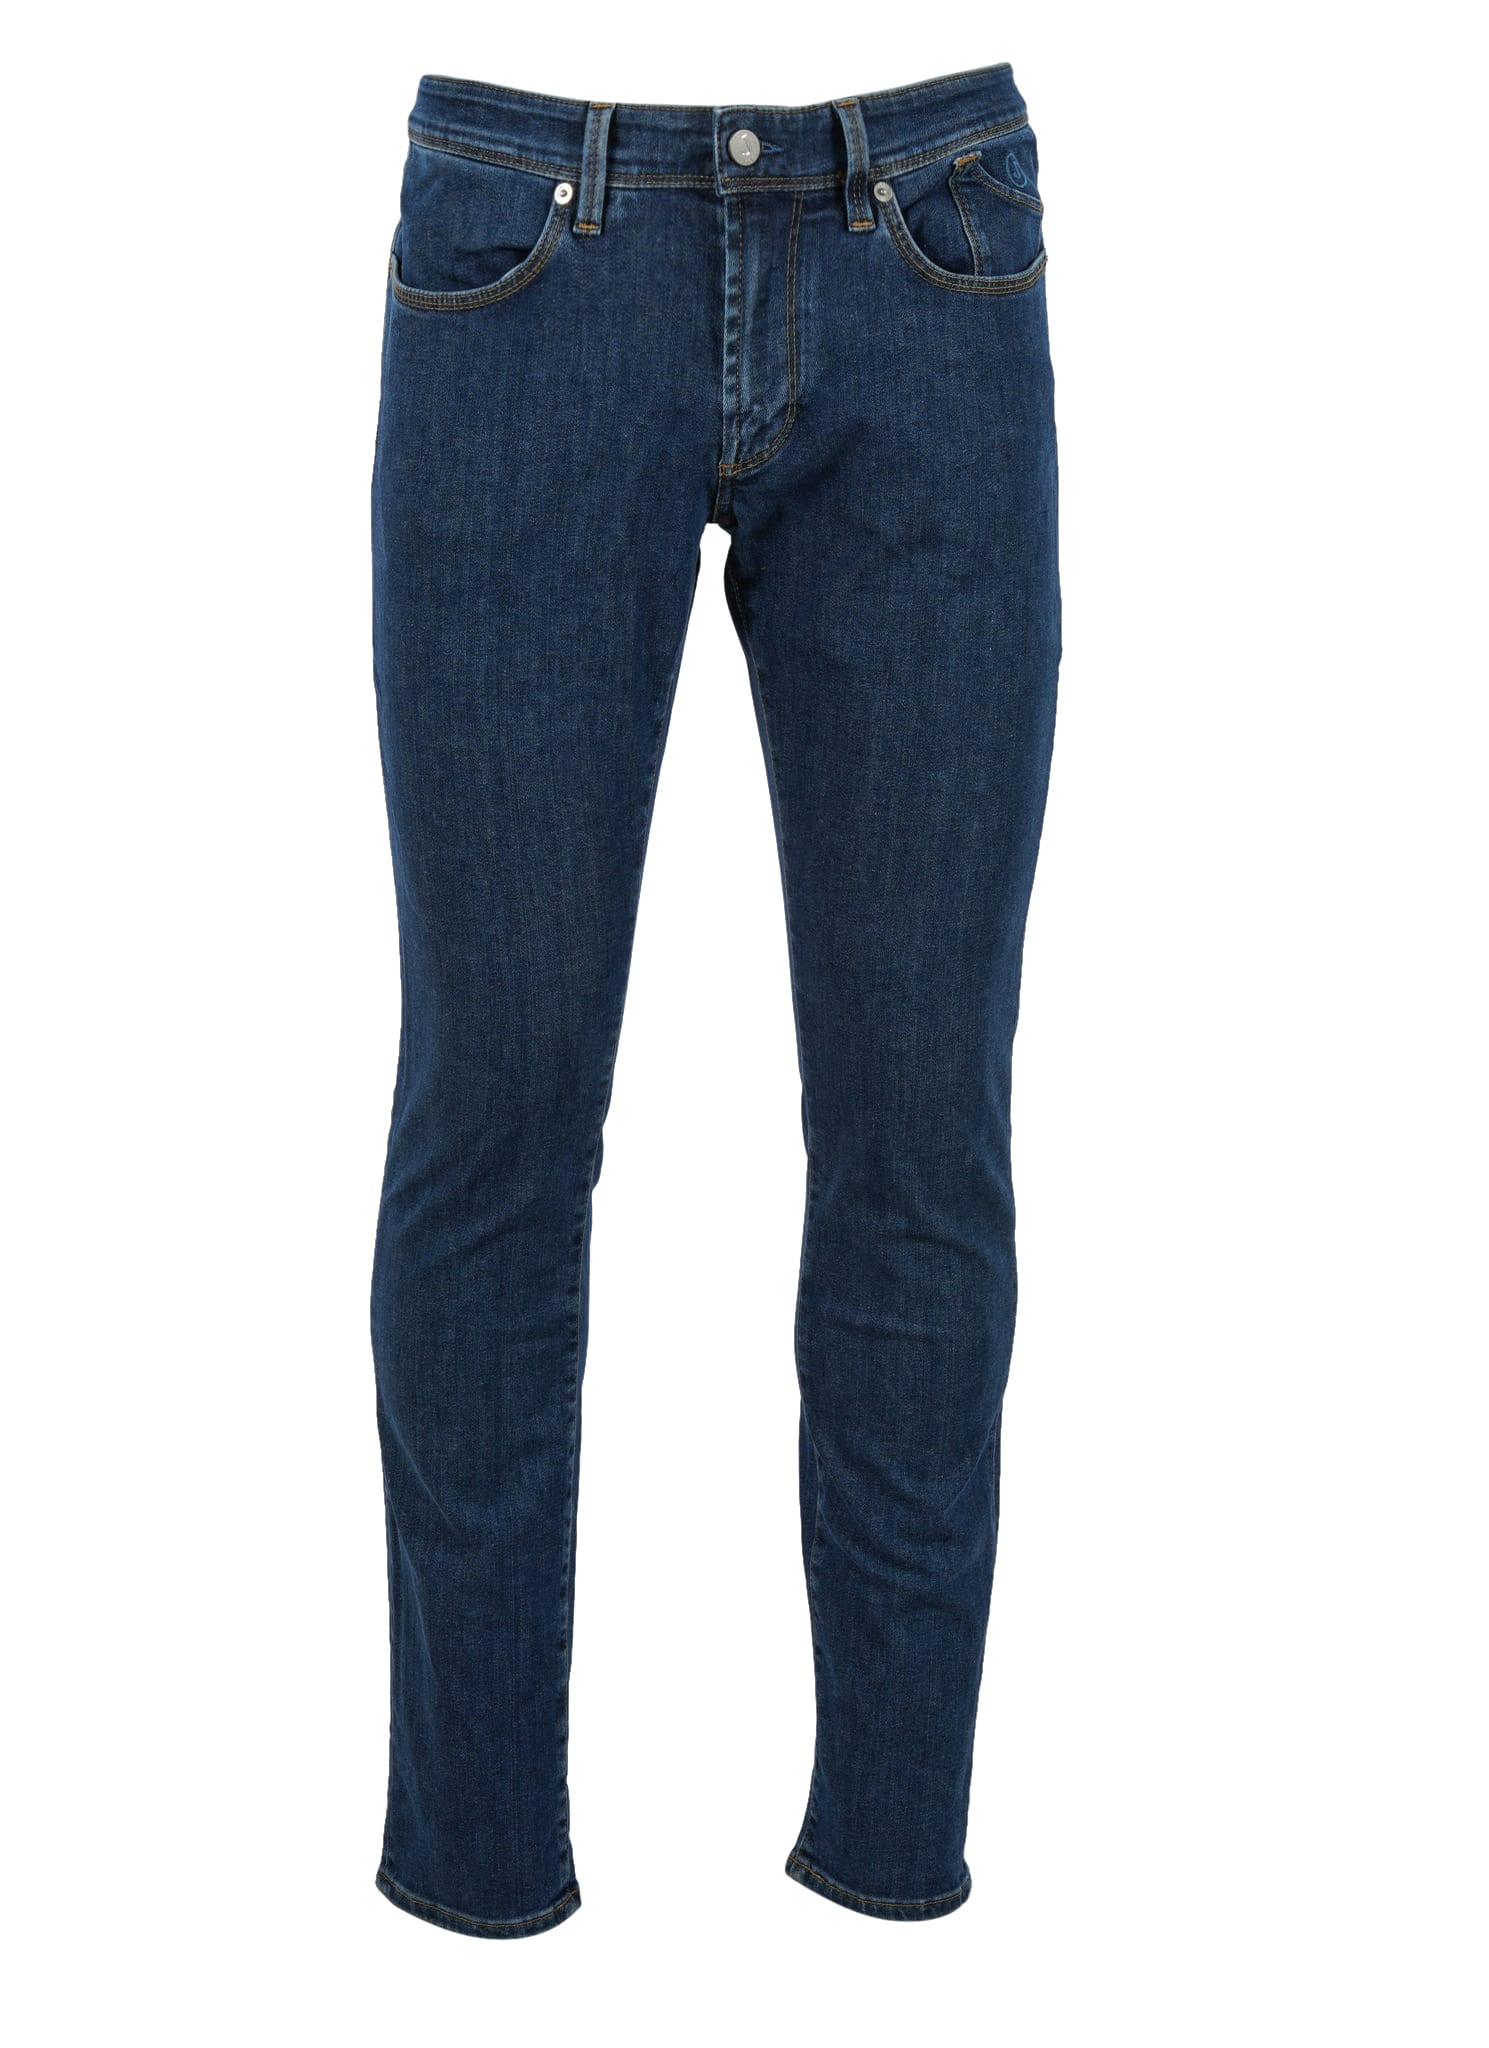 Pantalone Uomo Jeans